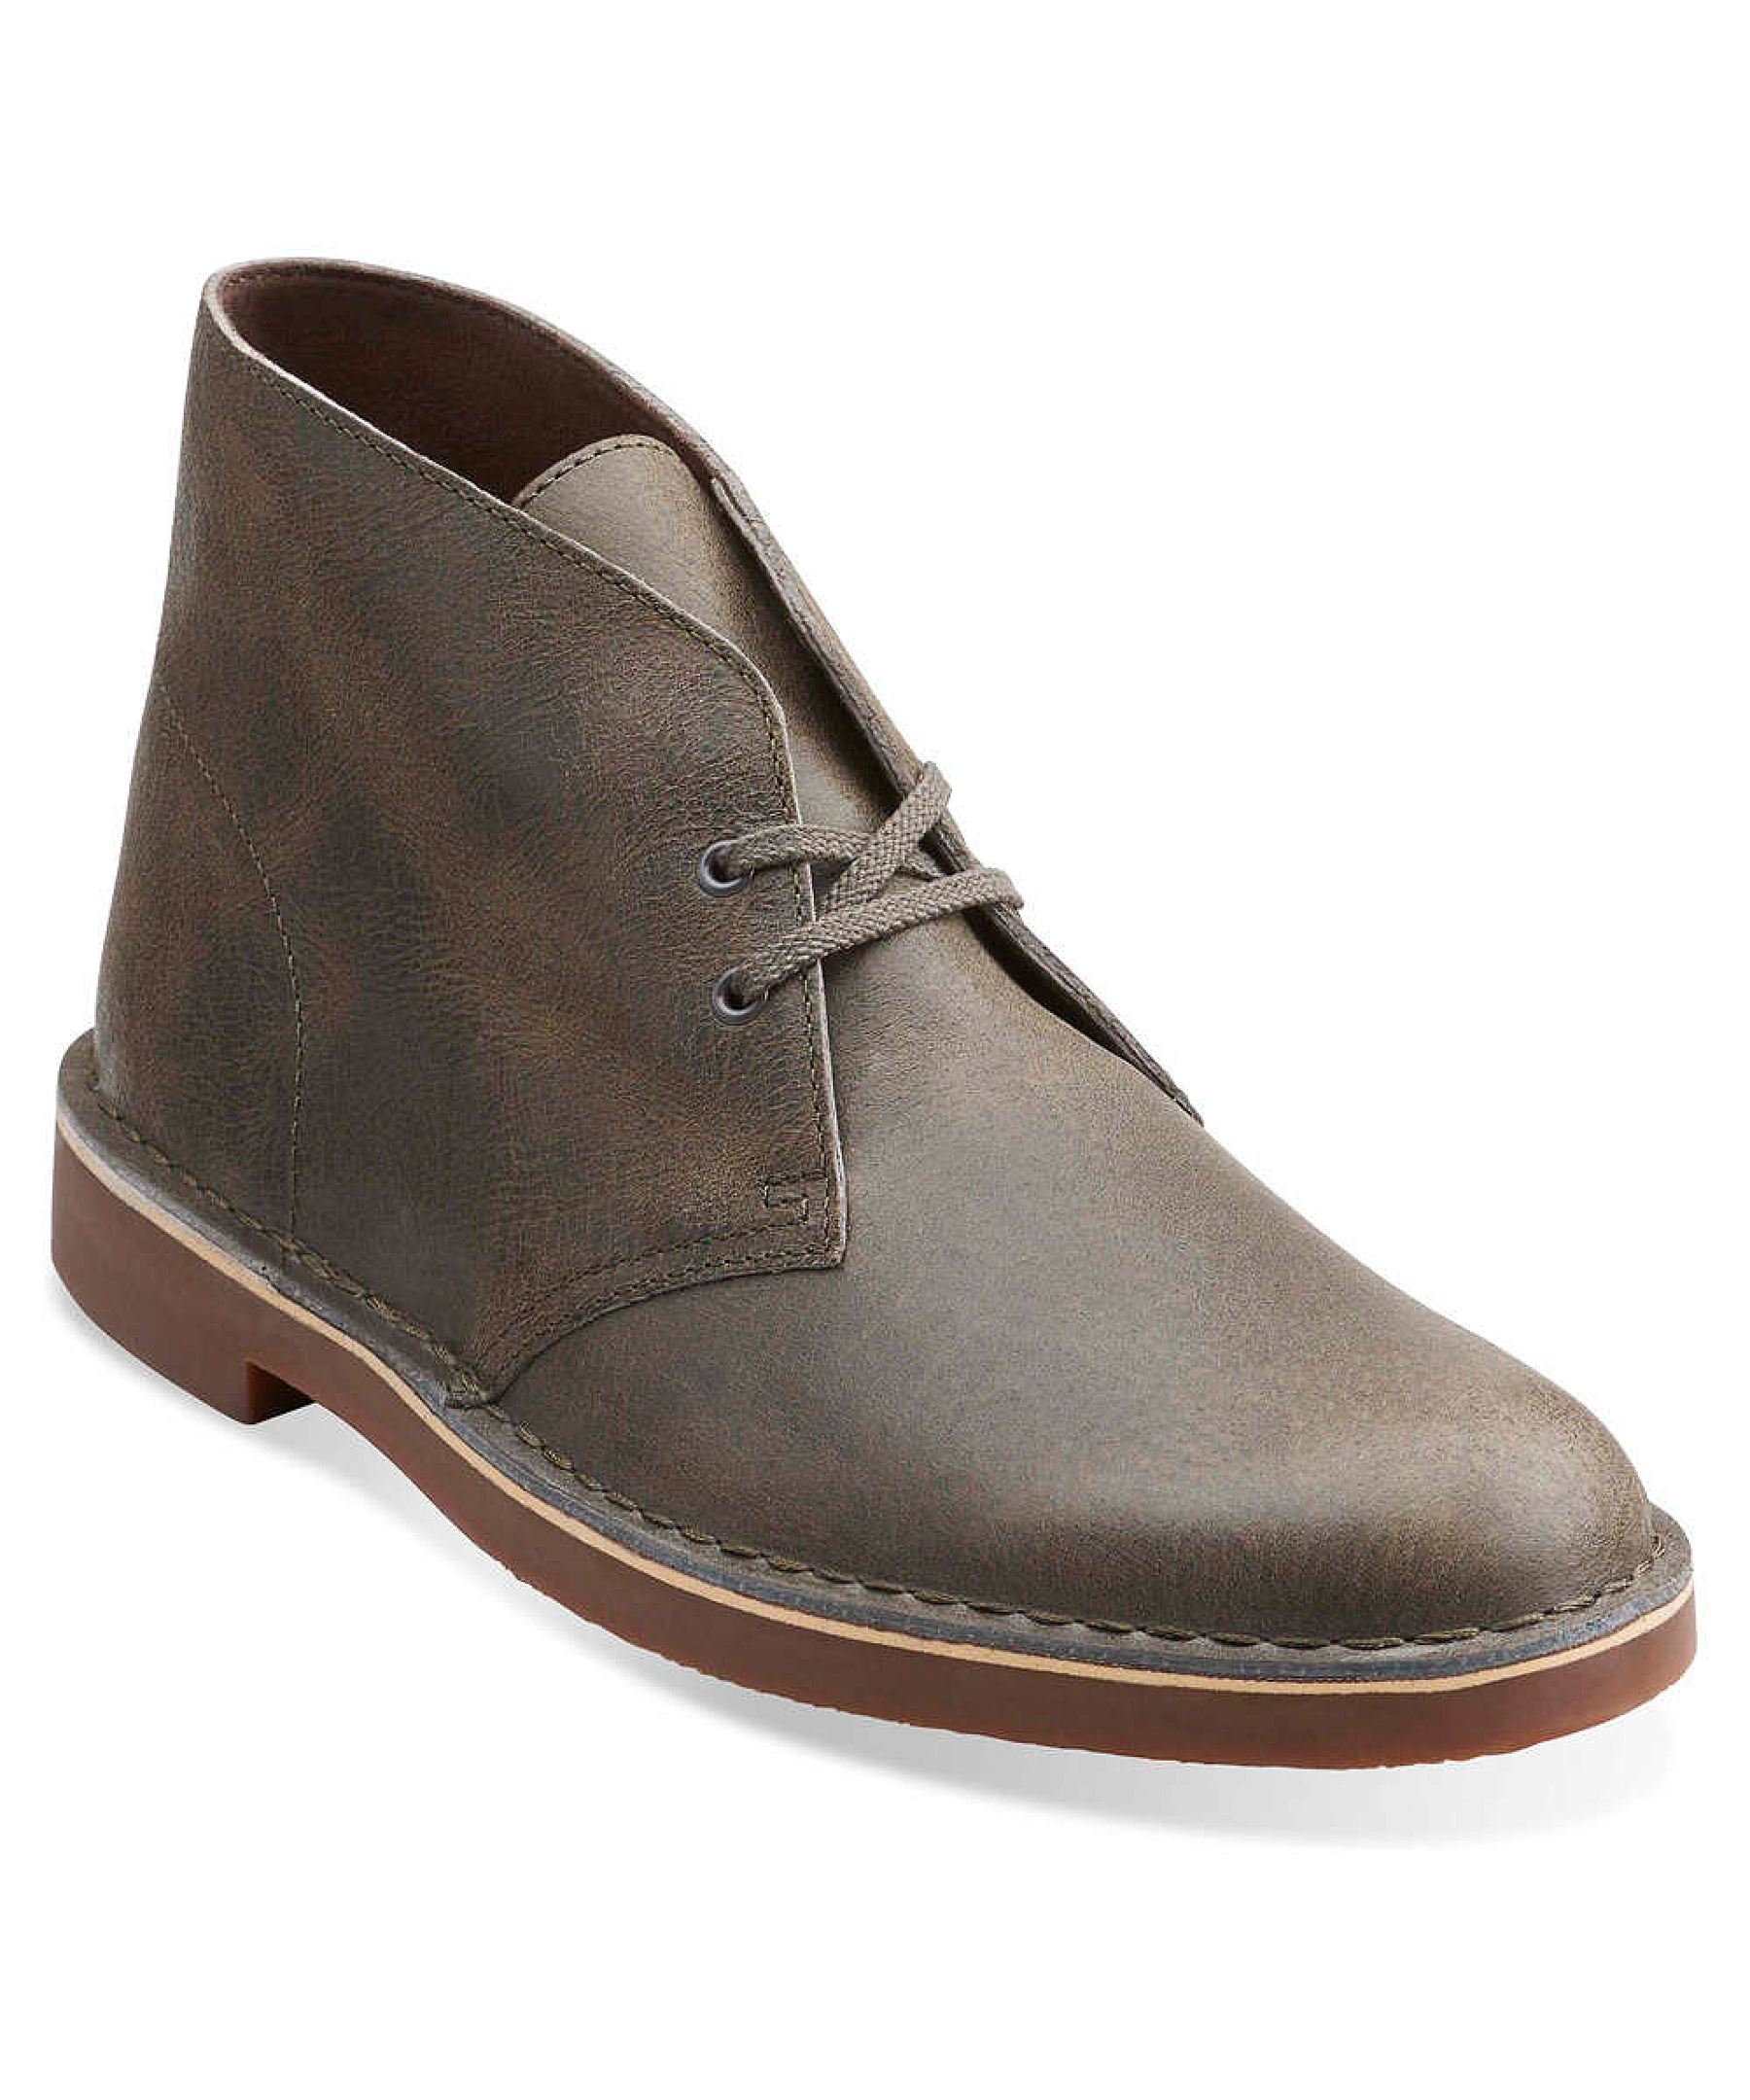 Cheap Clarks Shoes Mens